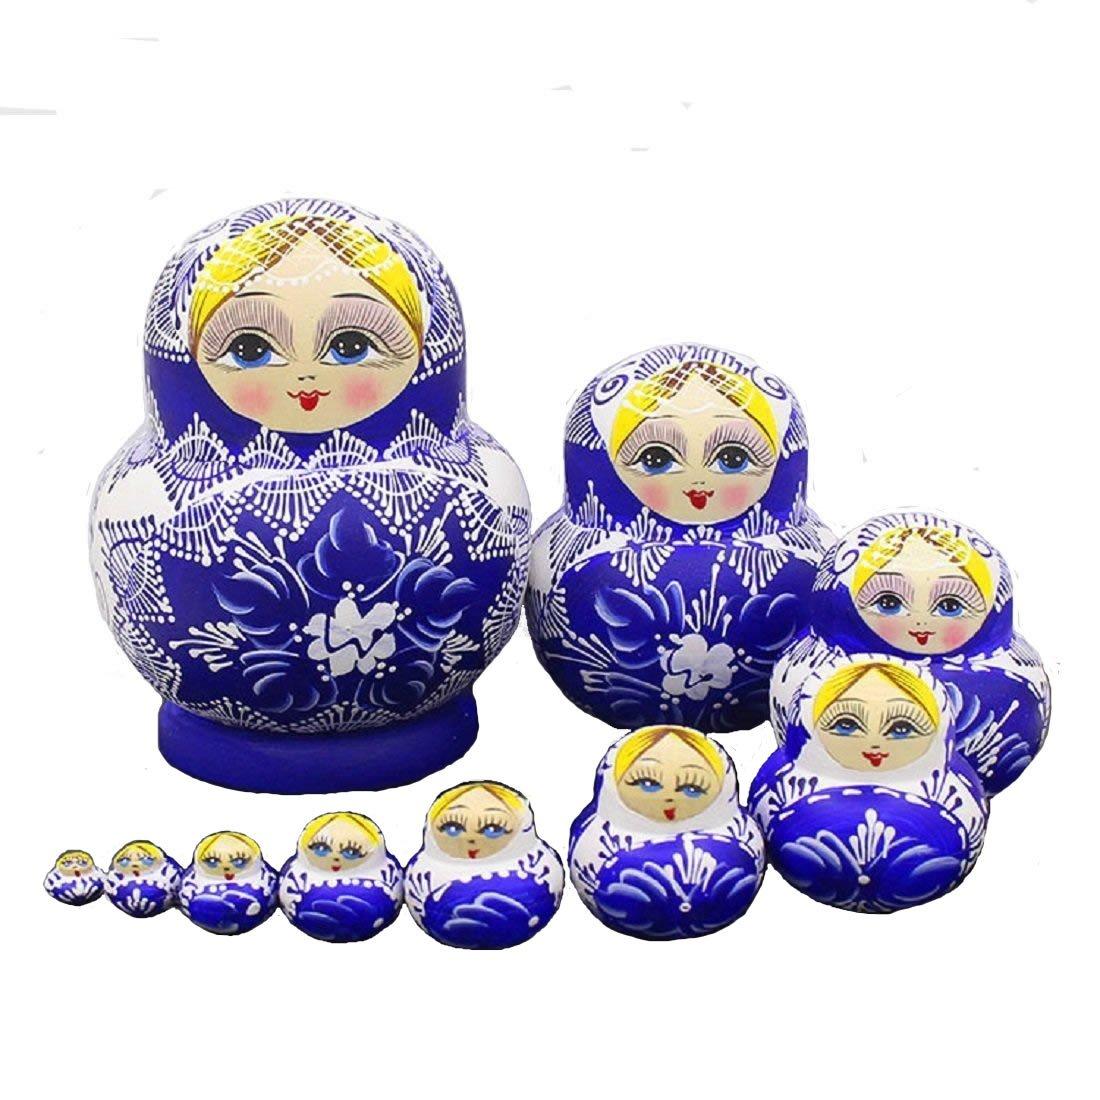 LK King&Light 10pcs beautiful Blue_White Russian Nesting Dolls Matryoshka Wooden Toys by LK